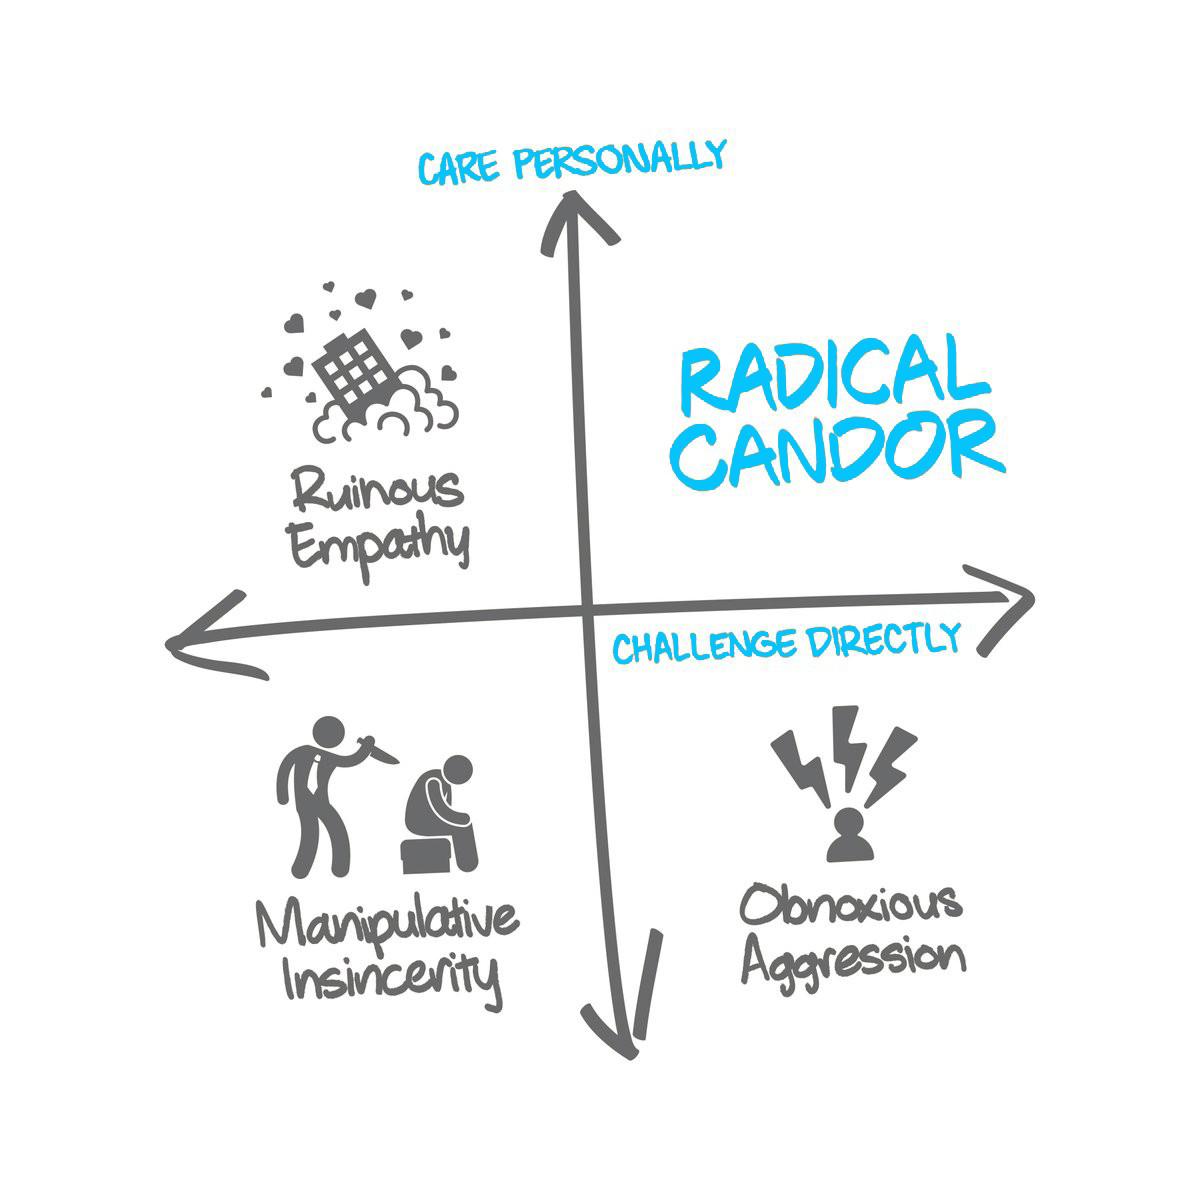 Kim Scott's framework for feedback in her book Radical Candor